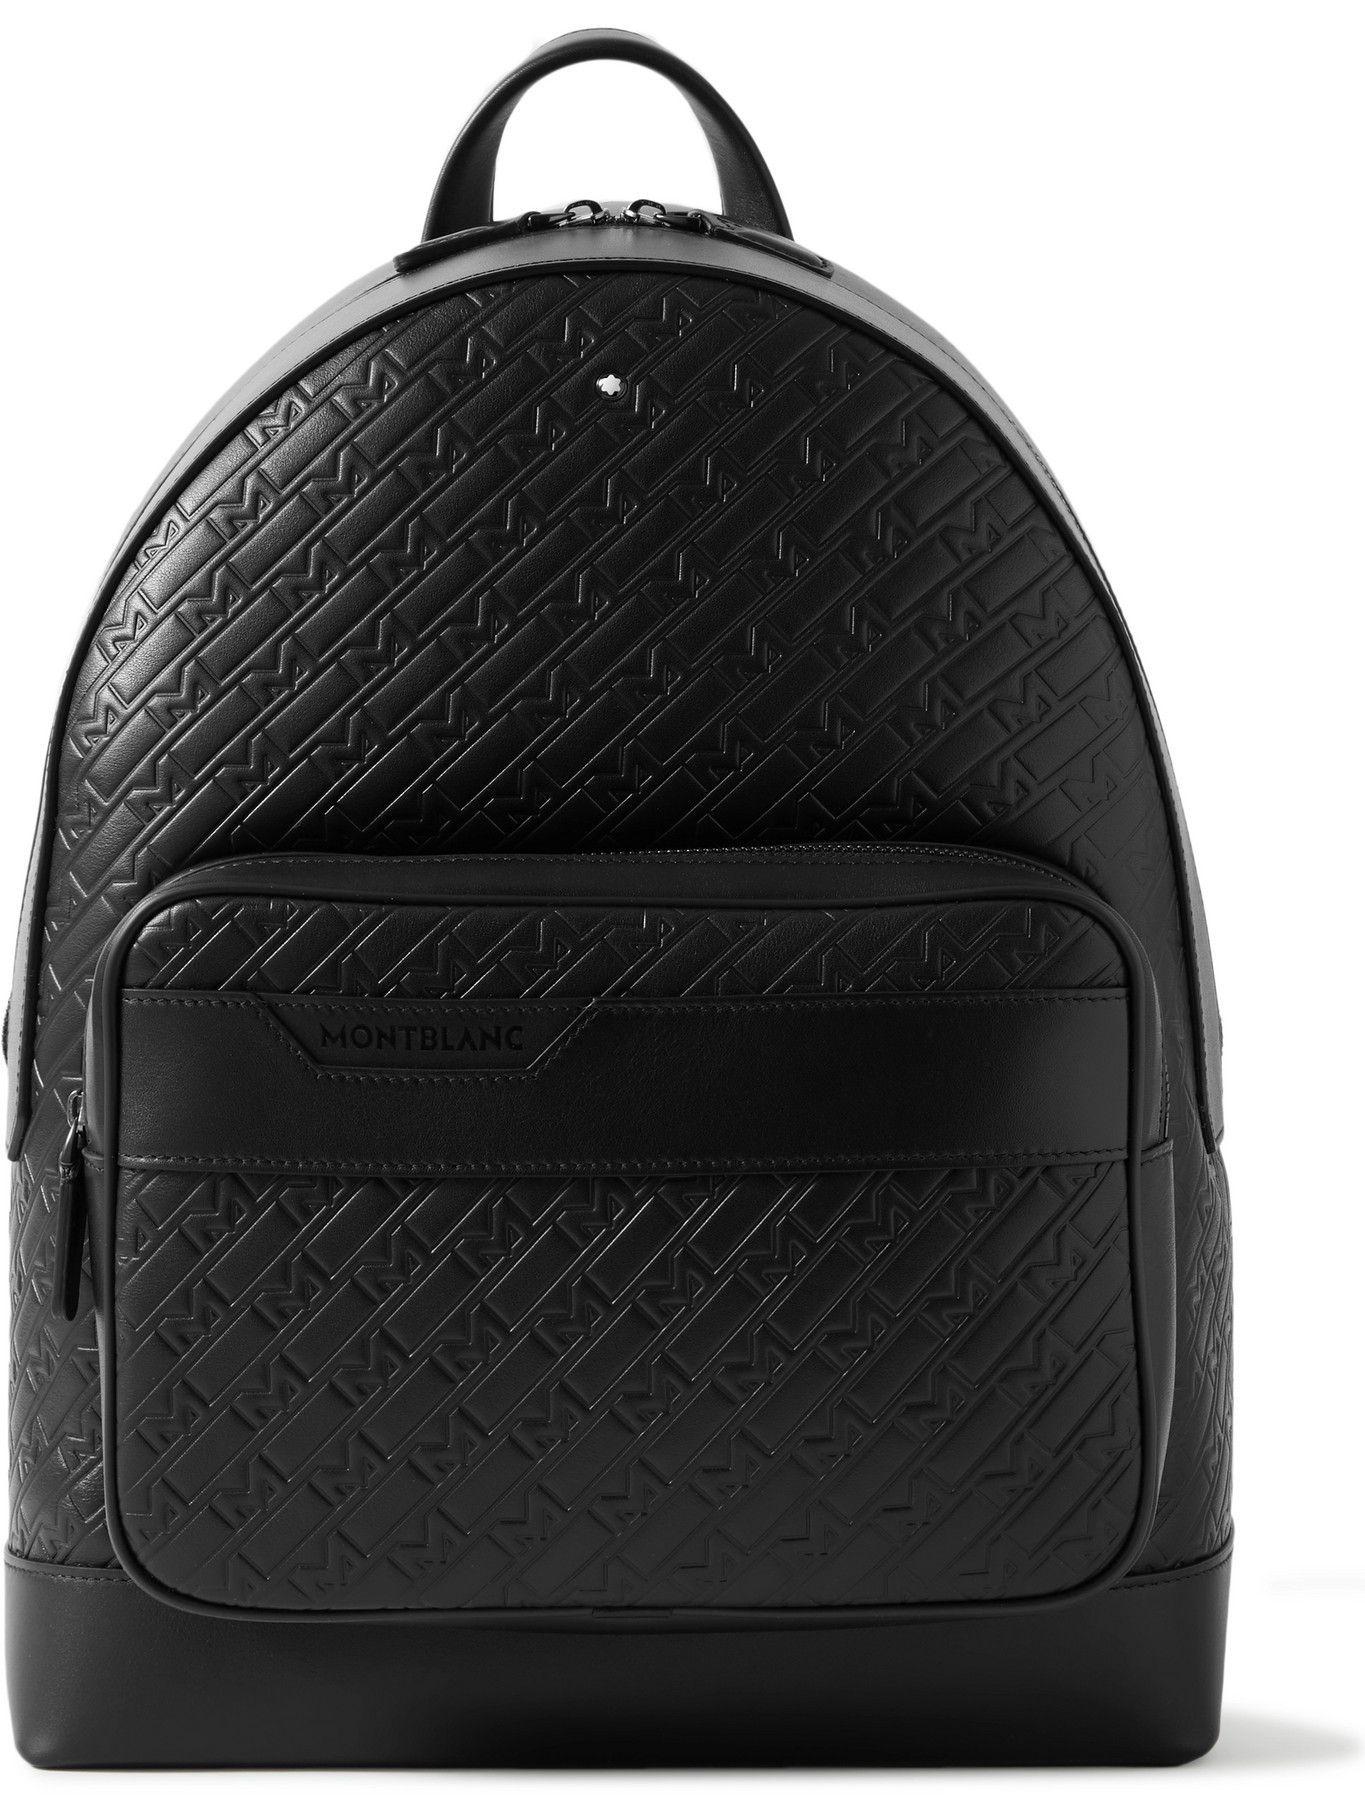 Photo: Montblanc - M_Gram 4810 Logo-Embossed Leather Backpack